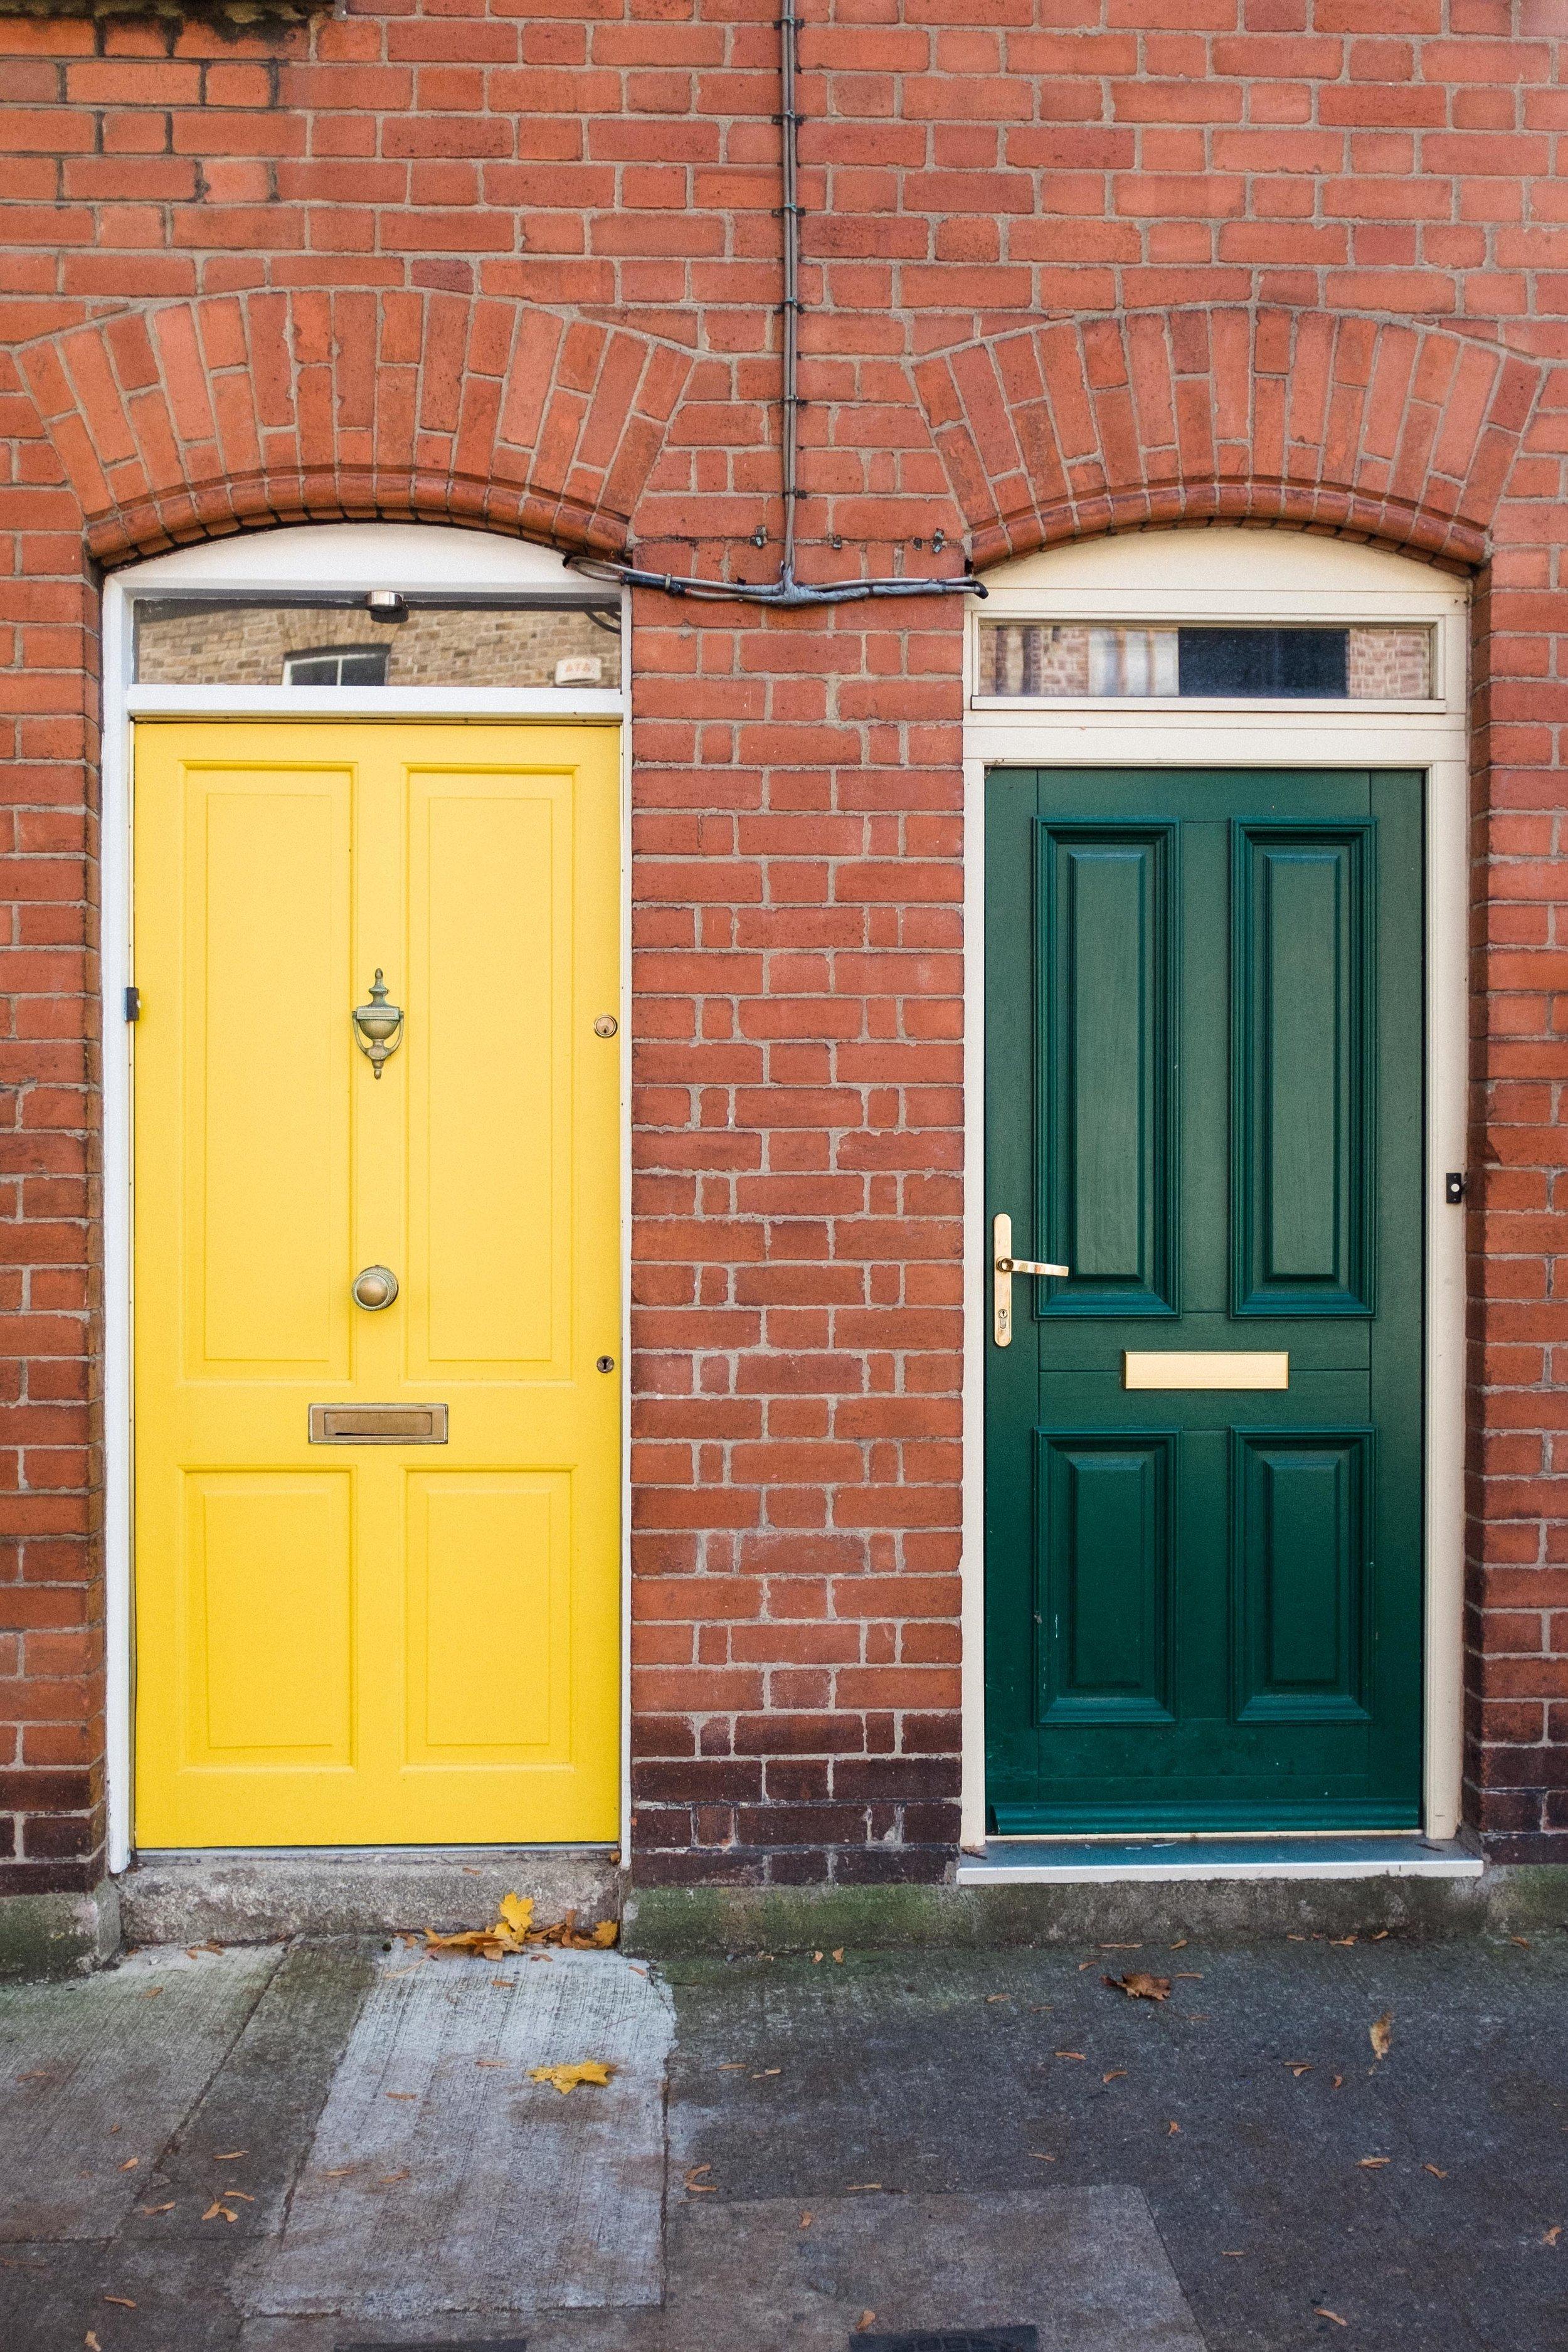 dublin-ireland-6142.jpg